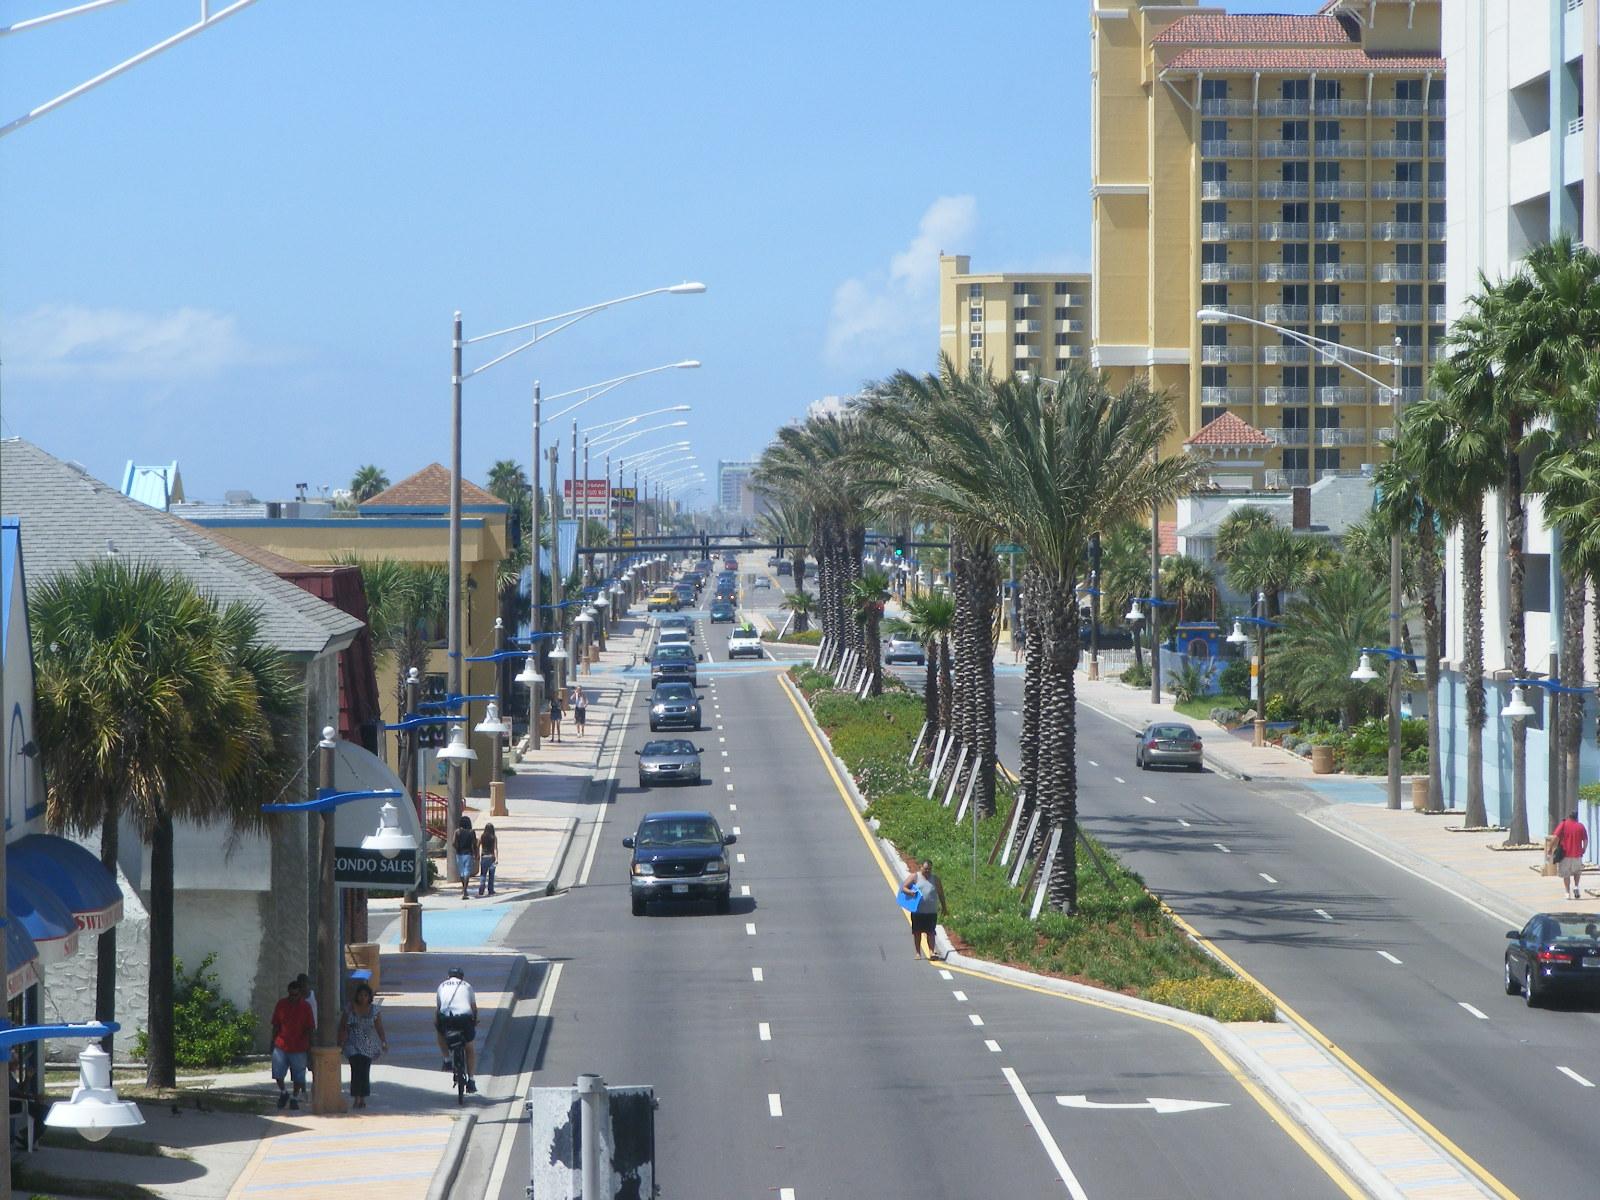 City Of Ormond Beach Building Permit Application